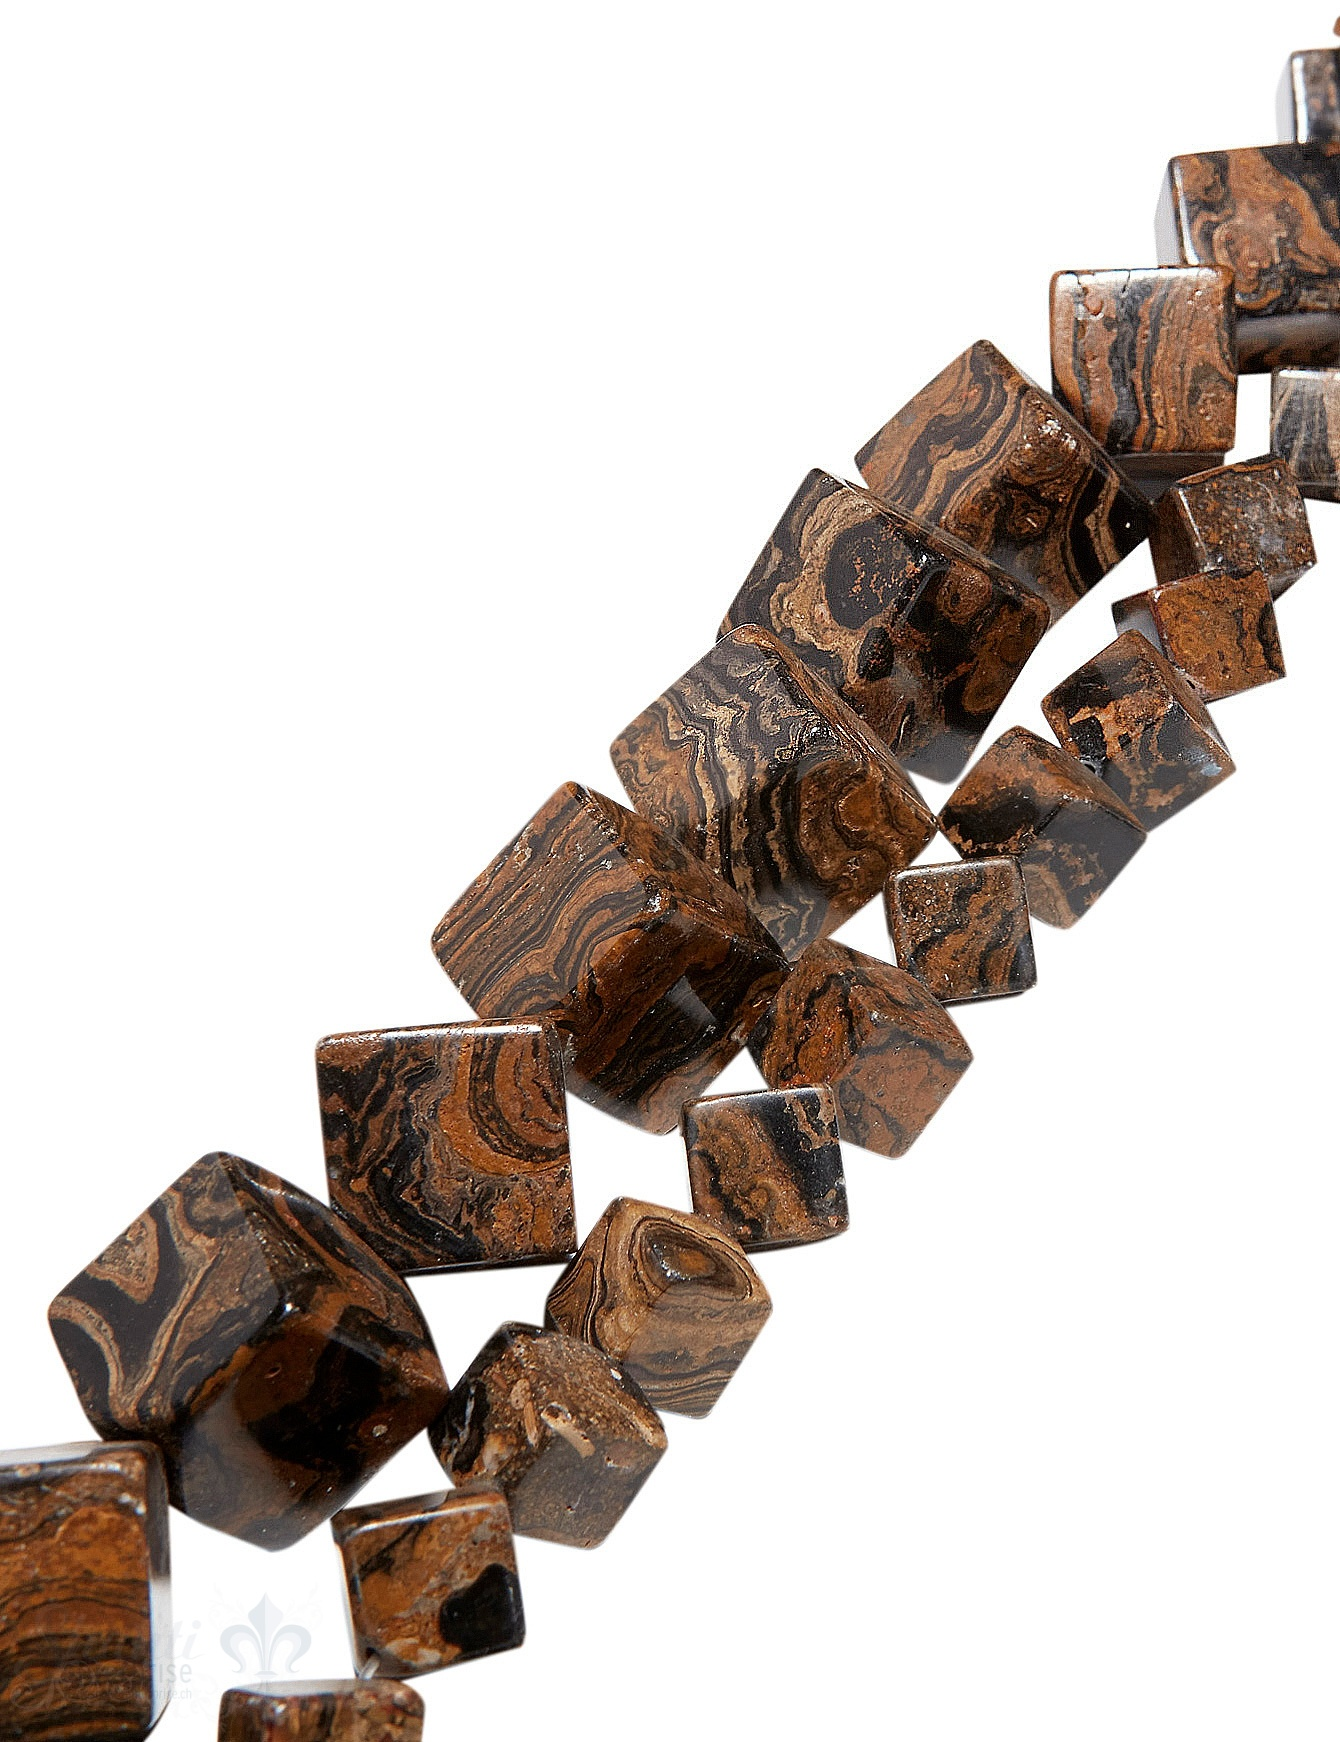 Schlangen-Jaspis Strang braun-beige poliert Würfel AAA gefleckt diagonal gebohrz